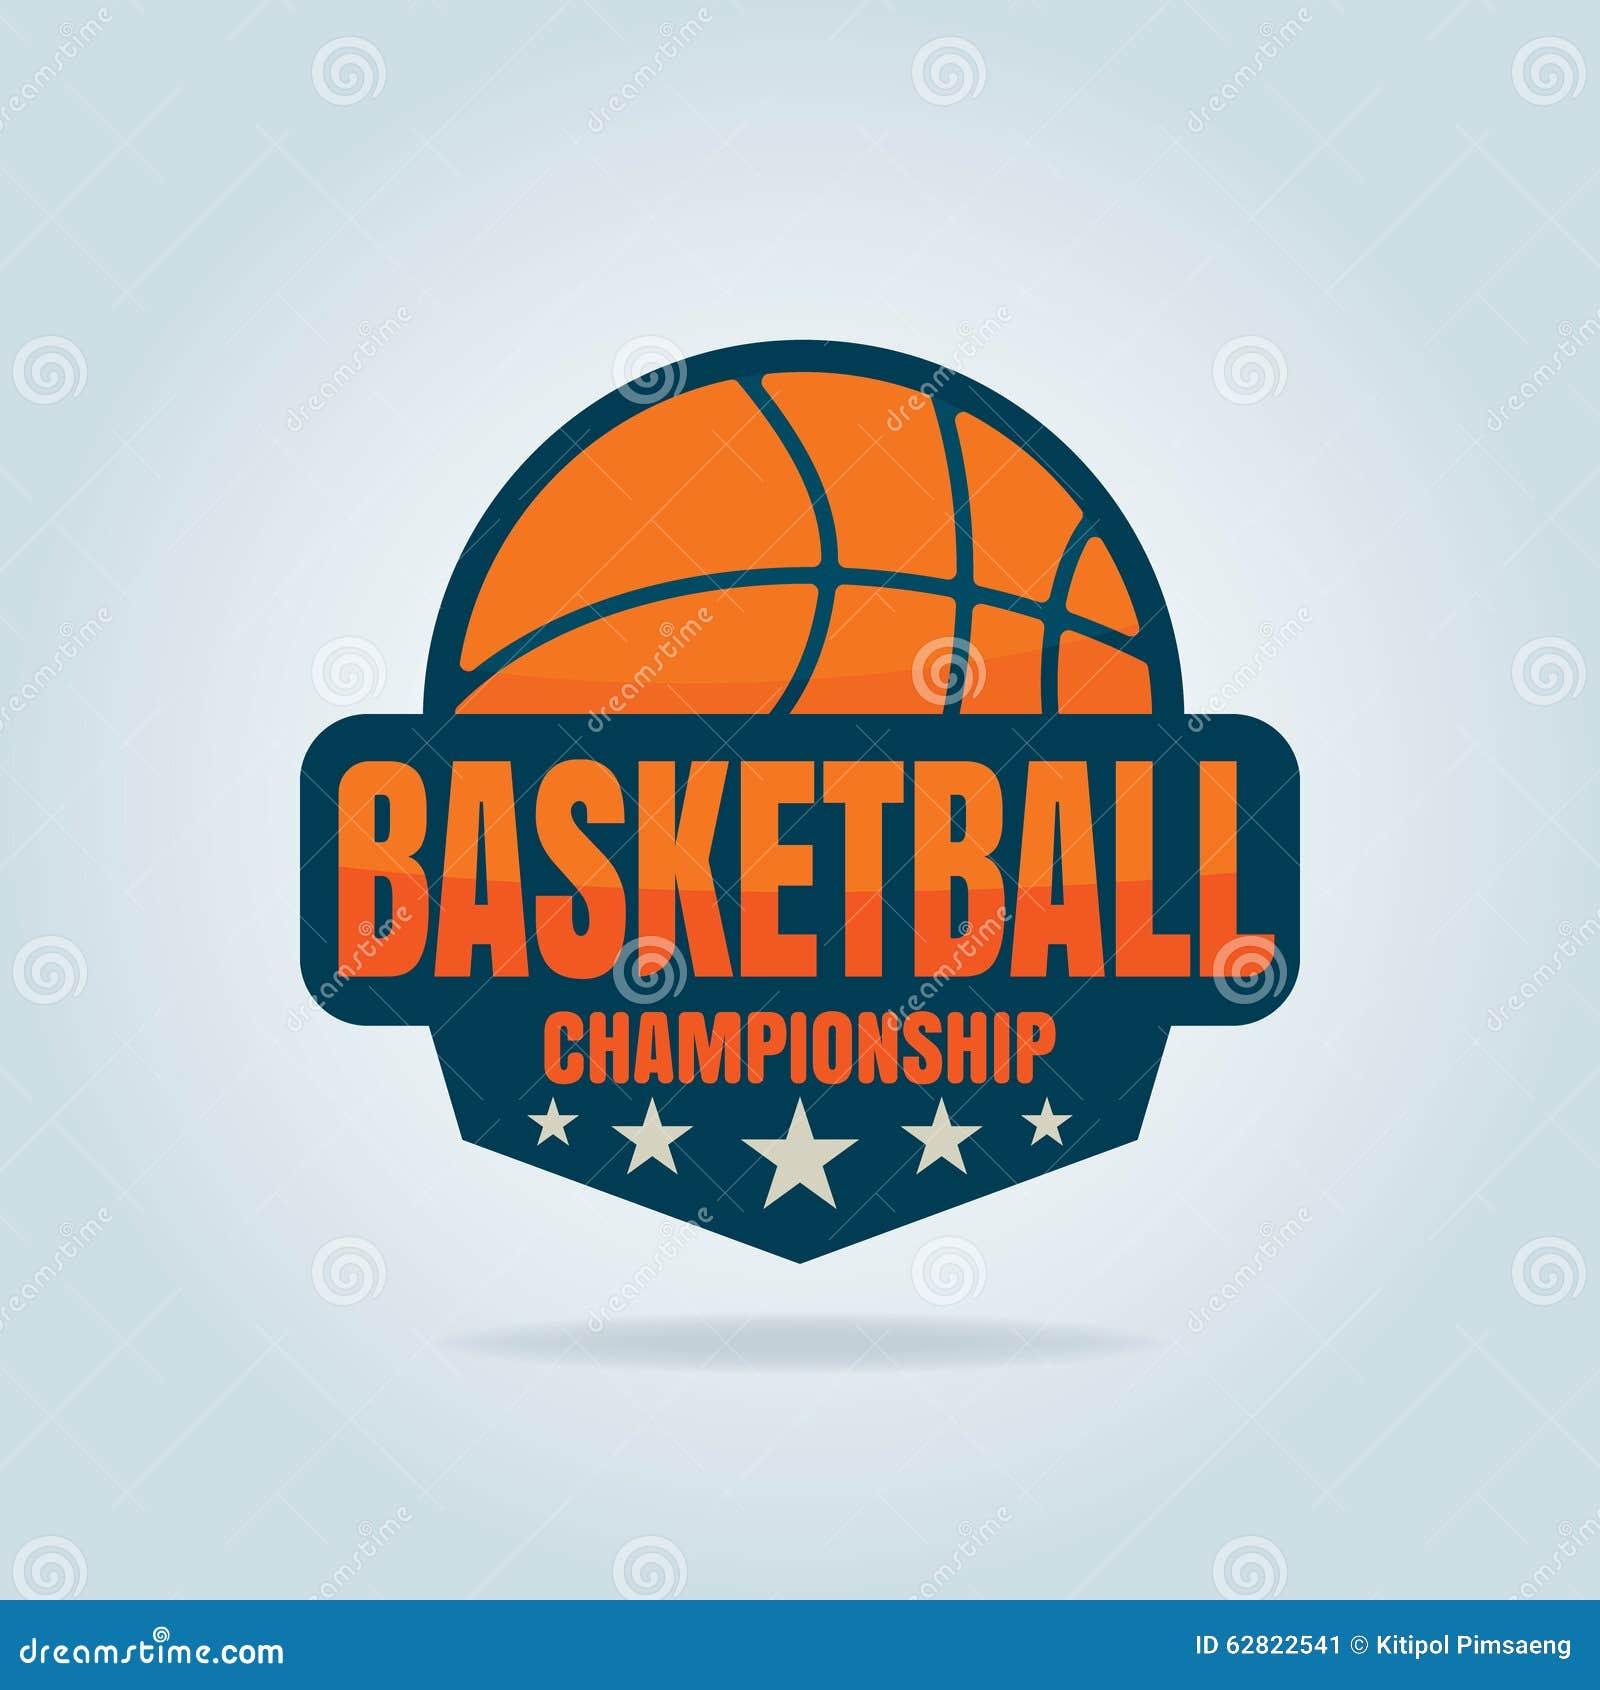 Basketball Logo Template Stock Vector - Image: 62822541